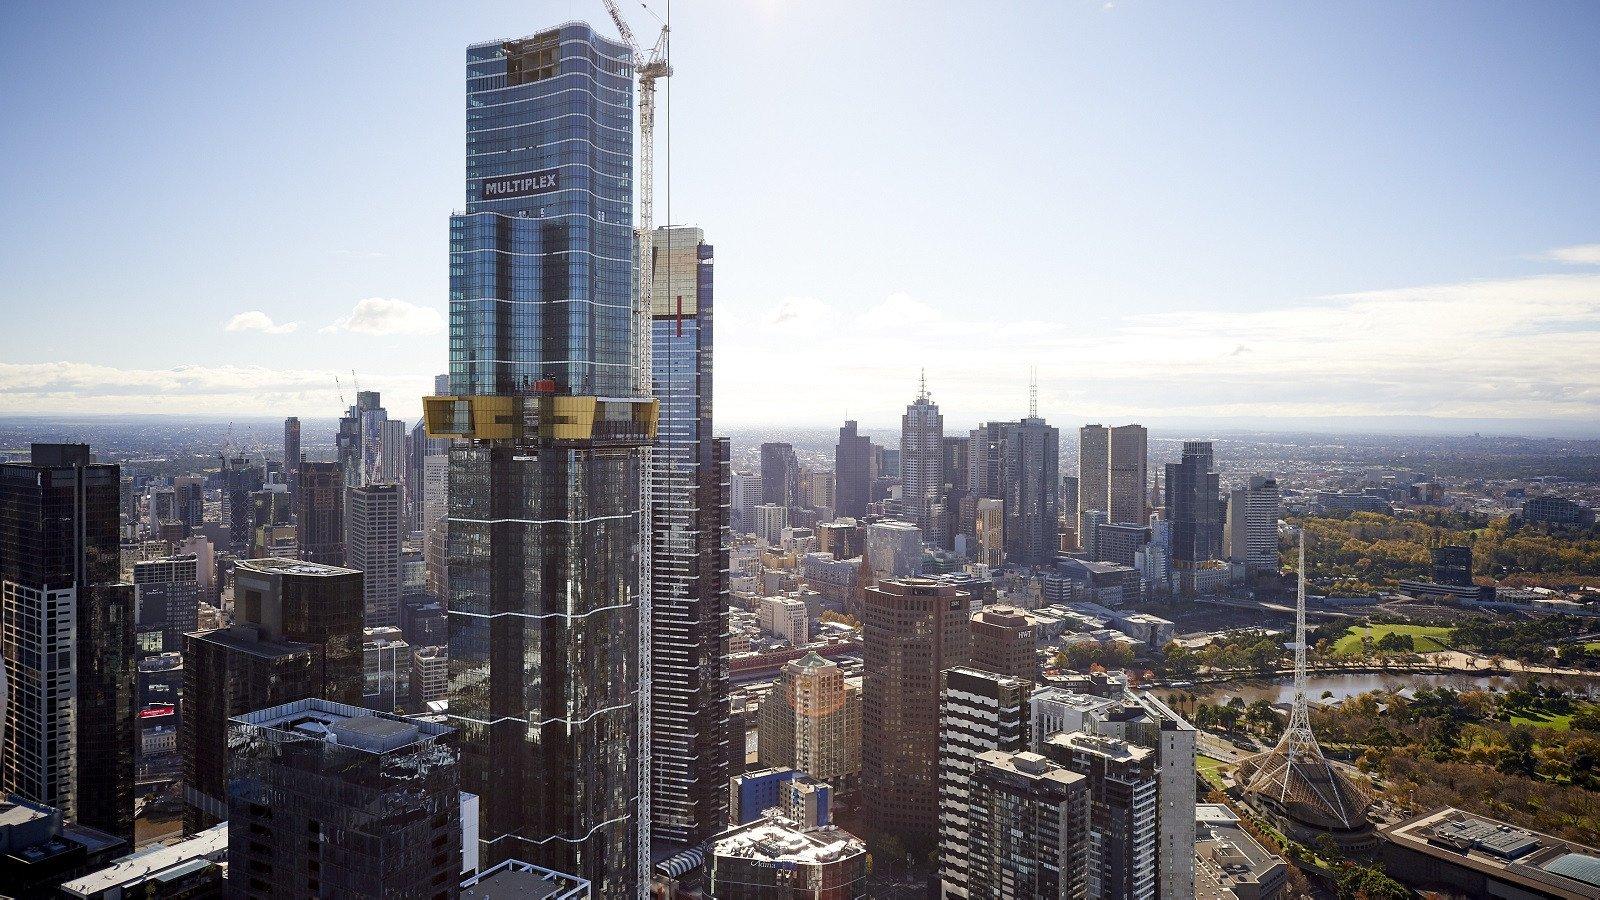 Australia 108 - Cloud Rise-image-0